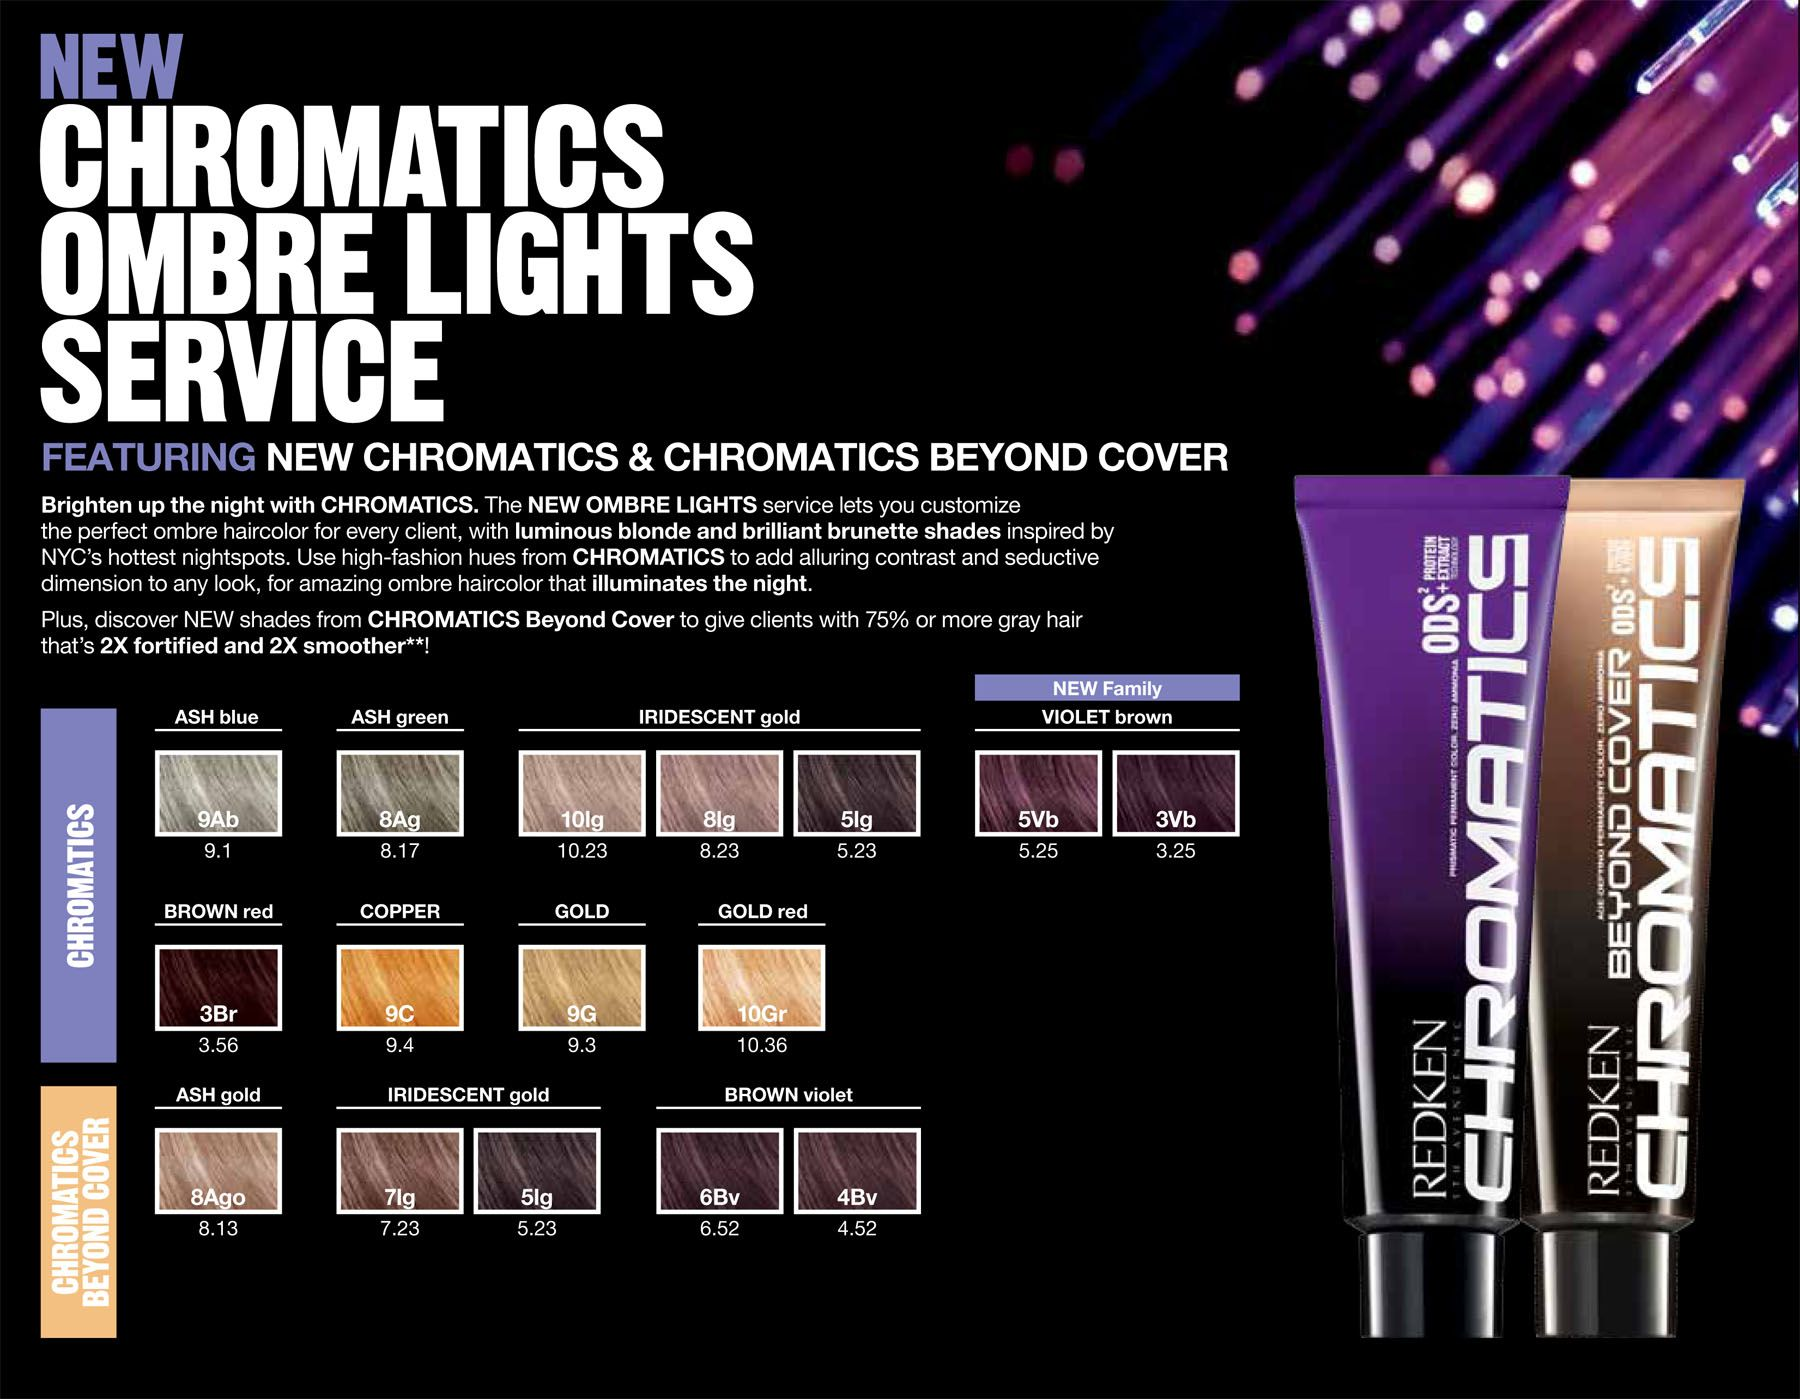 Redken chromatics ombre light service hair pinterest ombre redken chromatics ombre light service redken chromatics color chartredken nvjuhfo Images